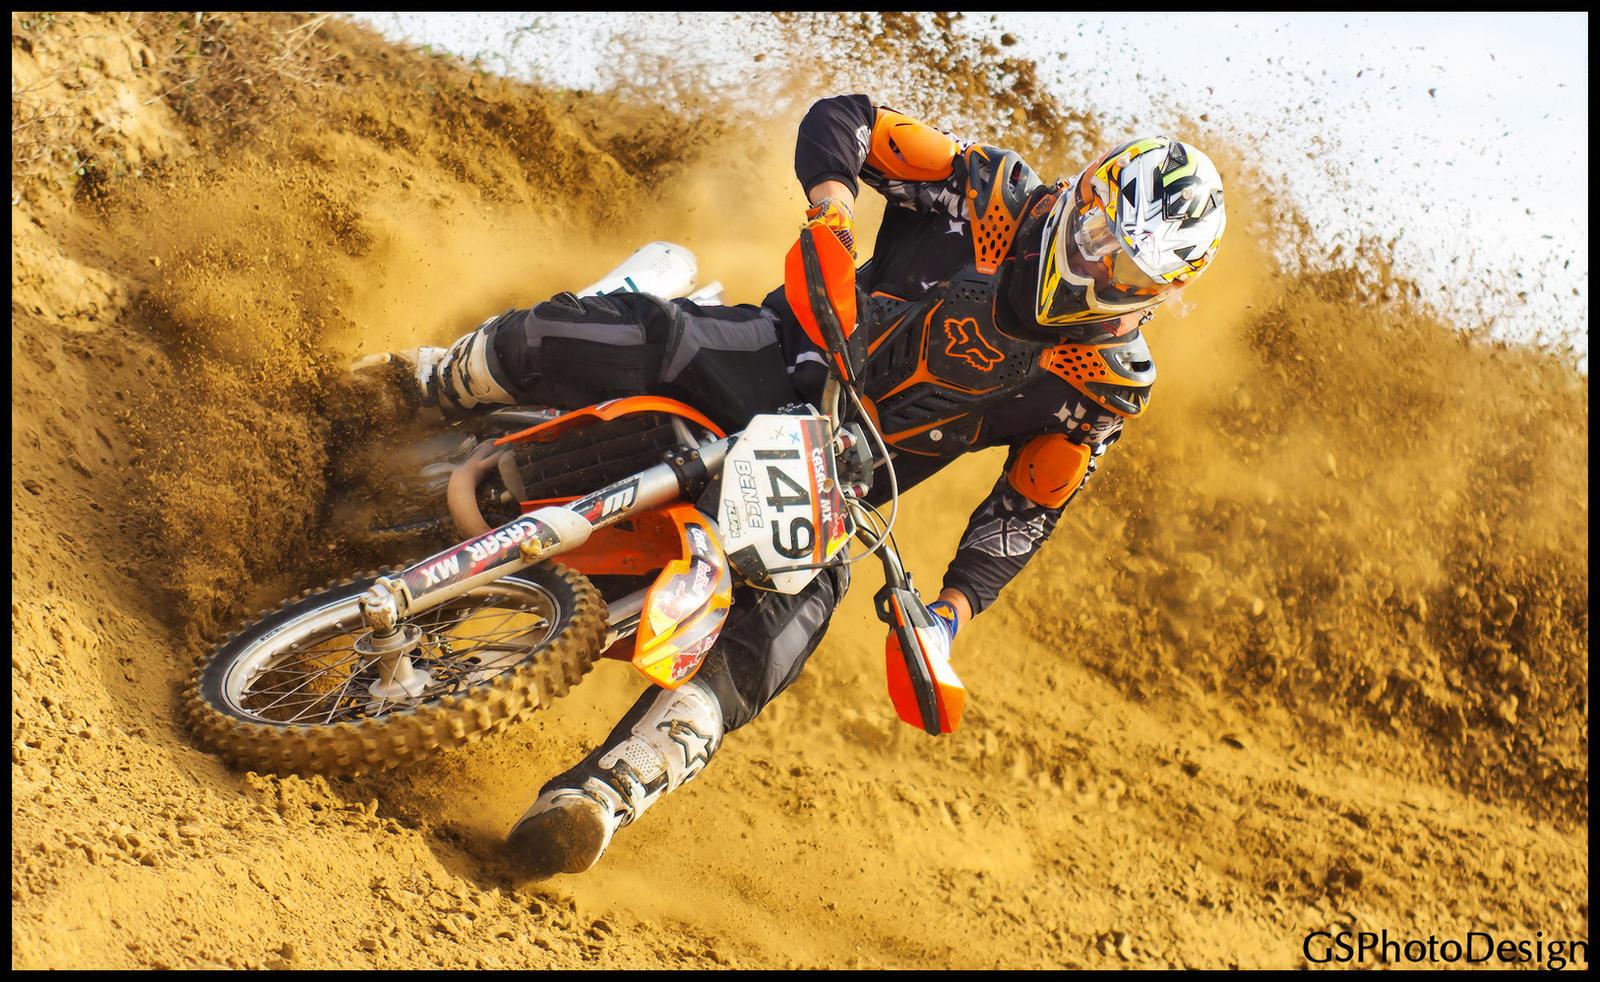 Dirt sport II by Ghostsk8ter